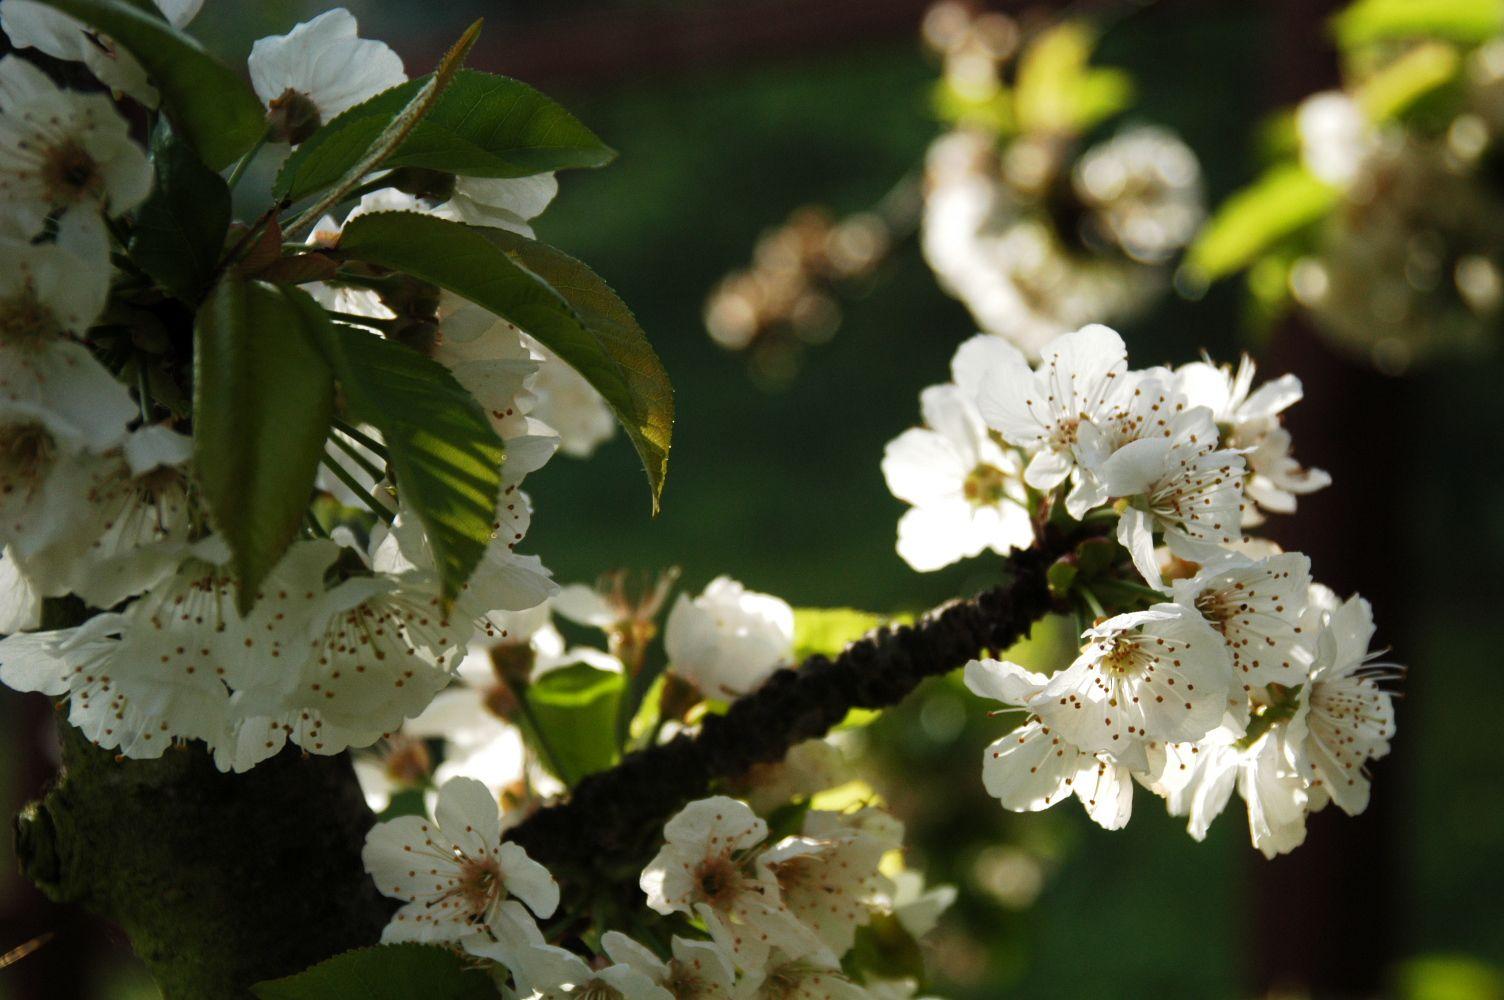 Cherry blossoms illuminated